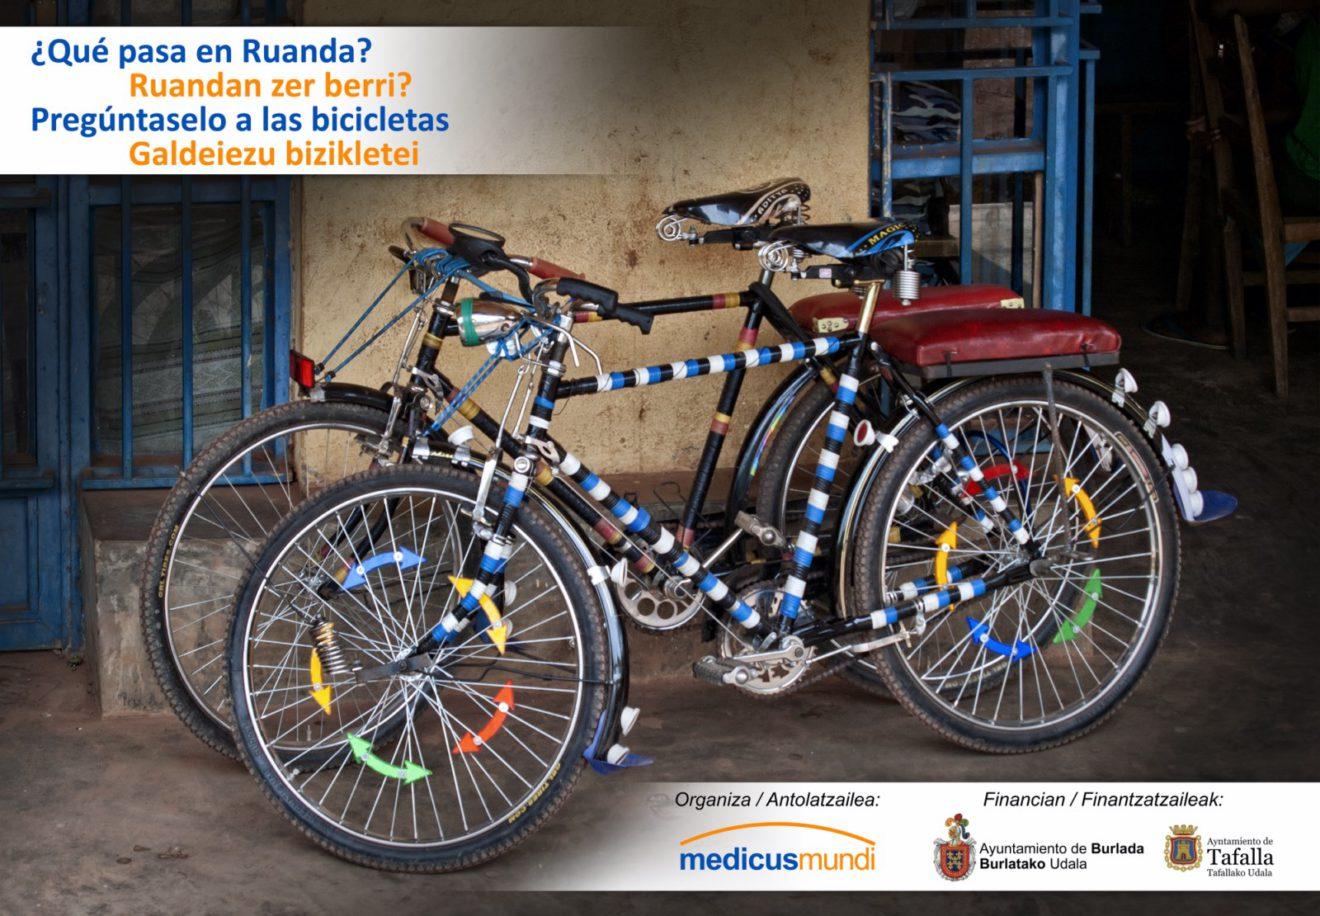 Exposición fotográfica ¿Qué pasa en Ruanda? Pregúntaselo a las bicicletas/ Ruandan zer berri? Galdeiezu bizikletei